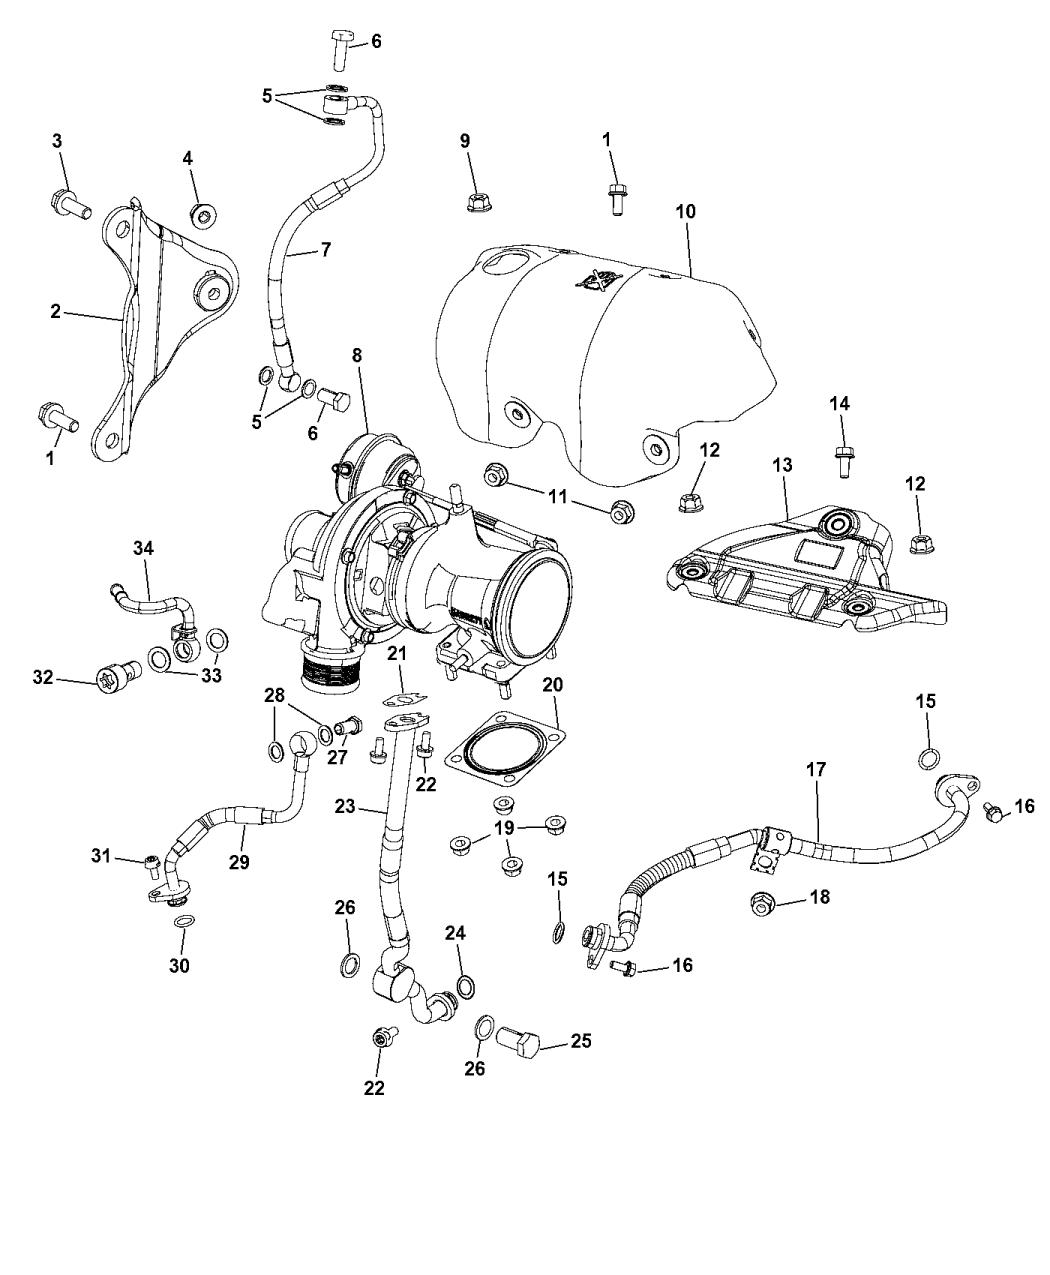 Dodge Dart 2 4 Engine Diagram • Wiring Diagram For Free